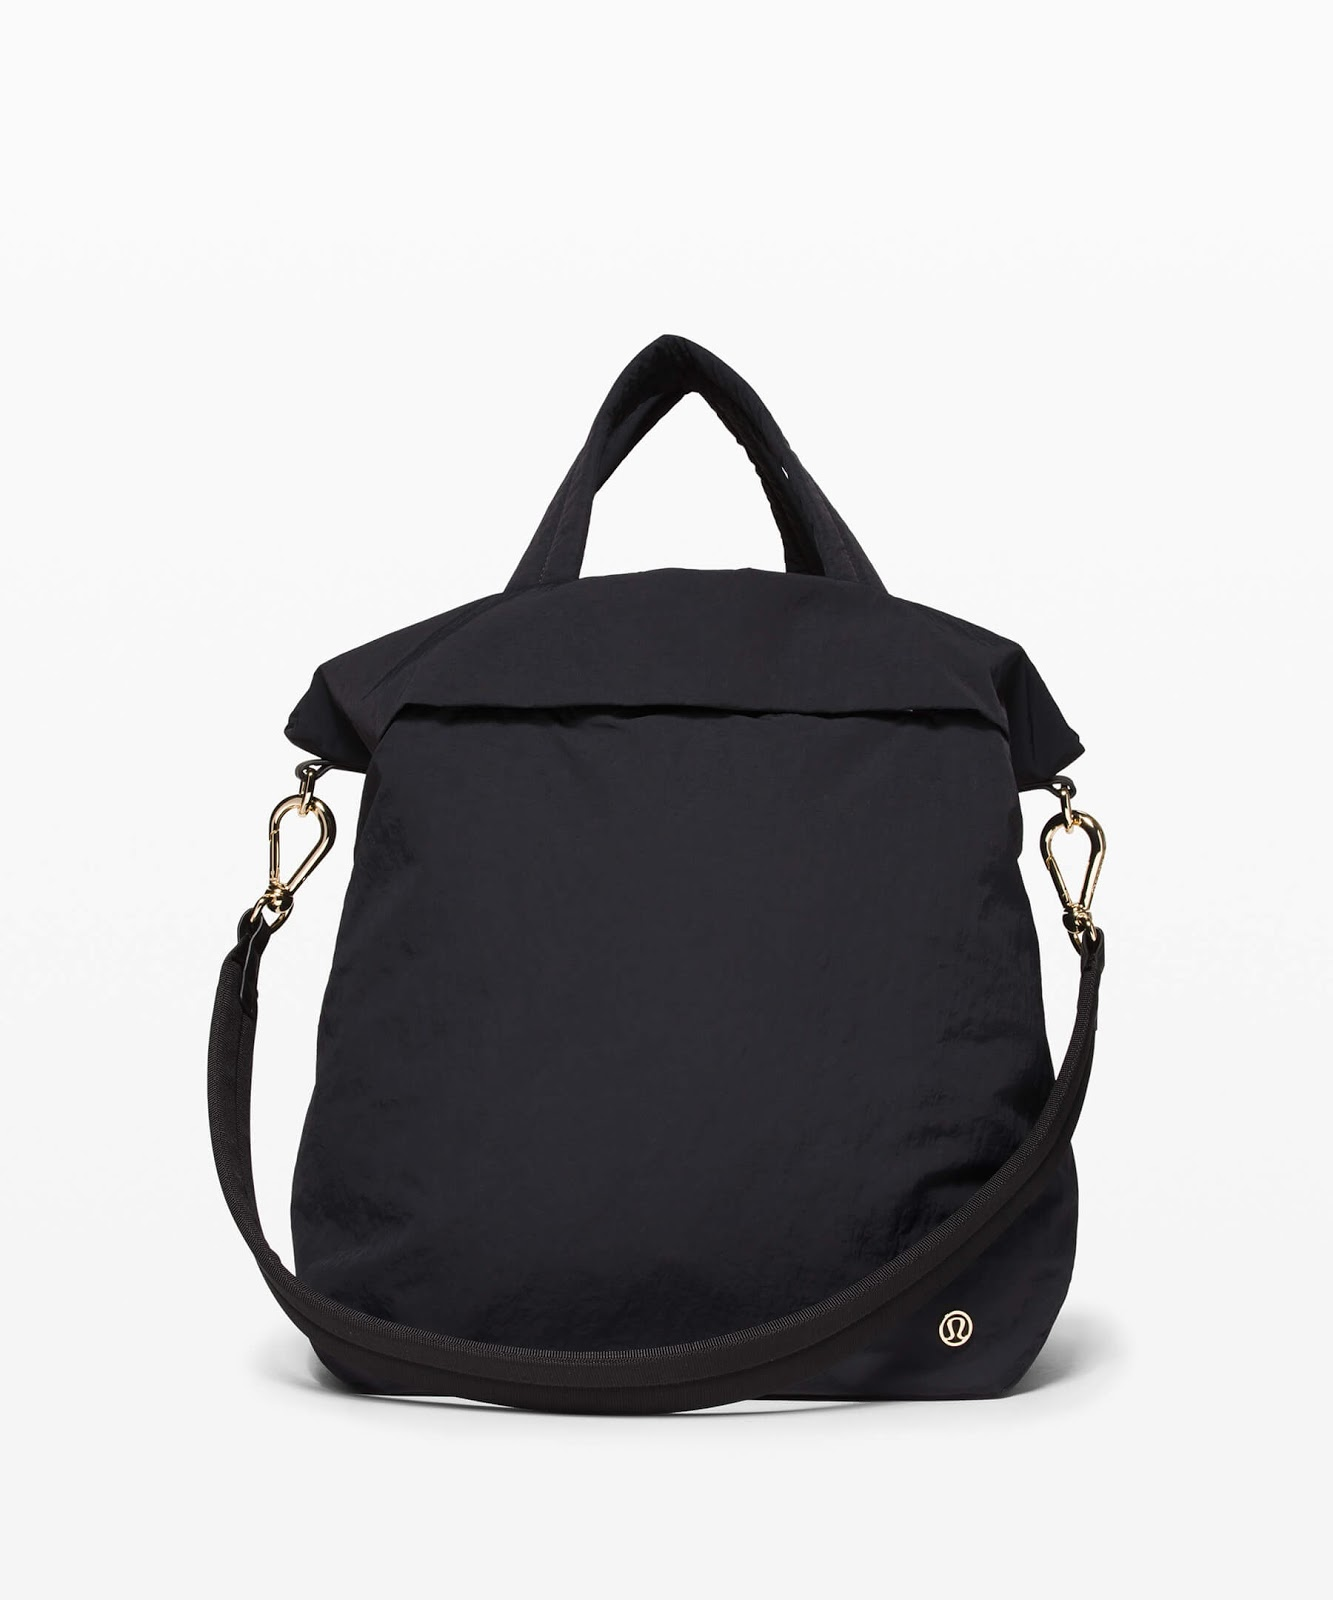 Lululemon On My Level Bag